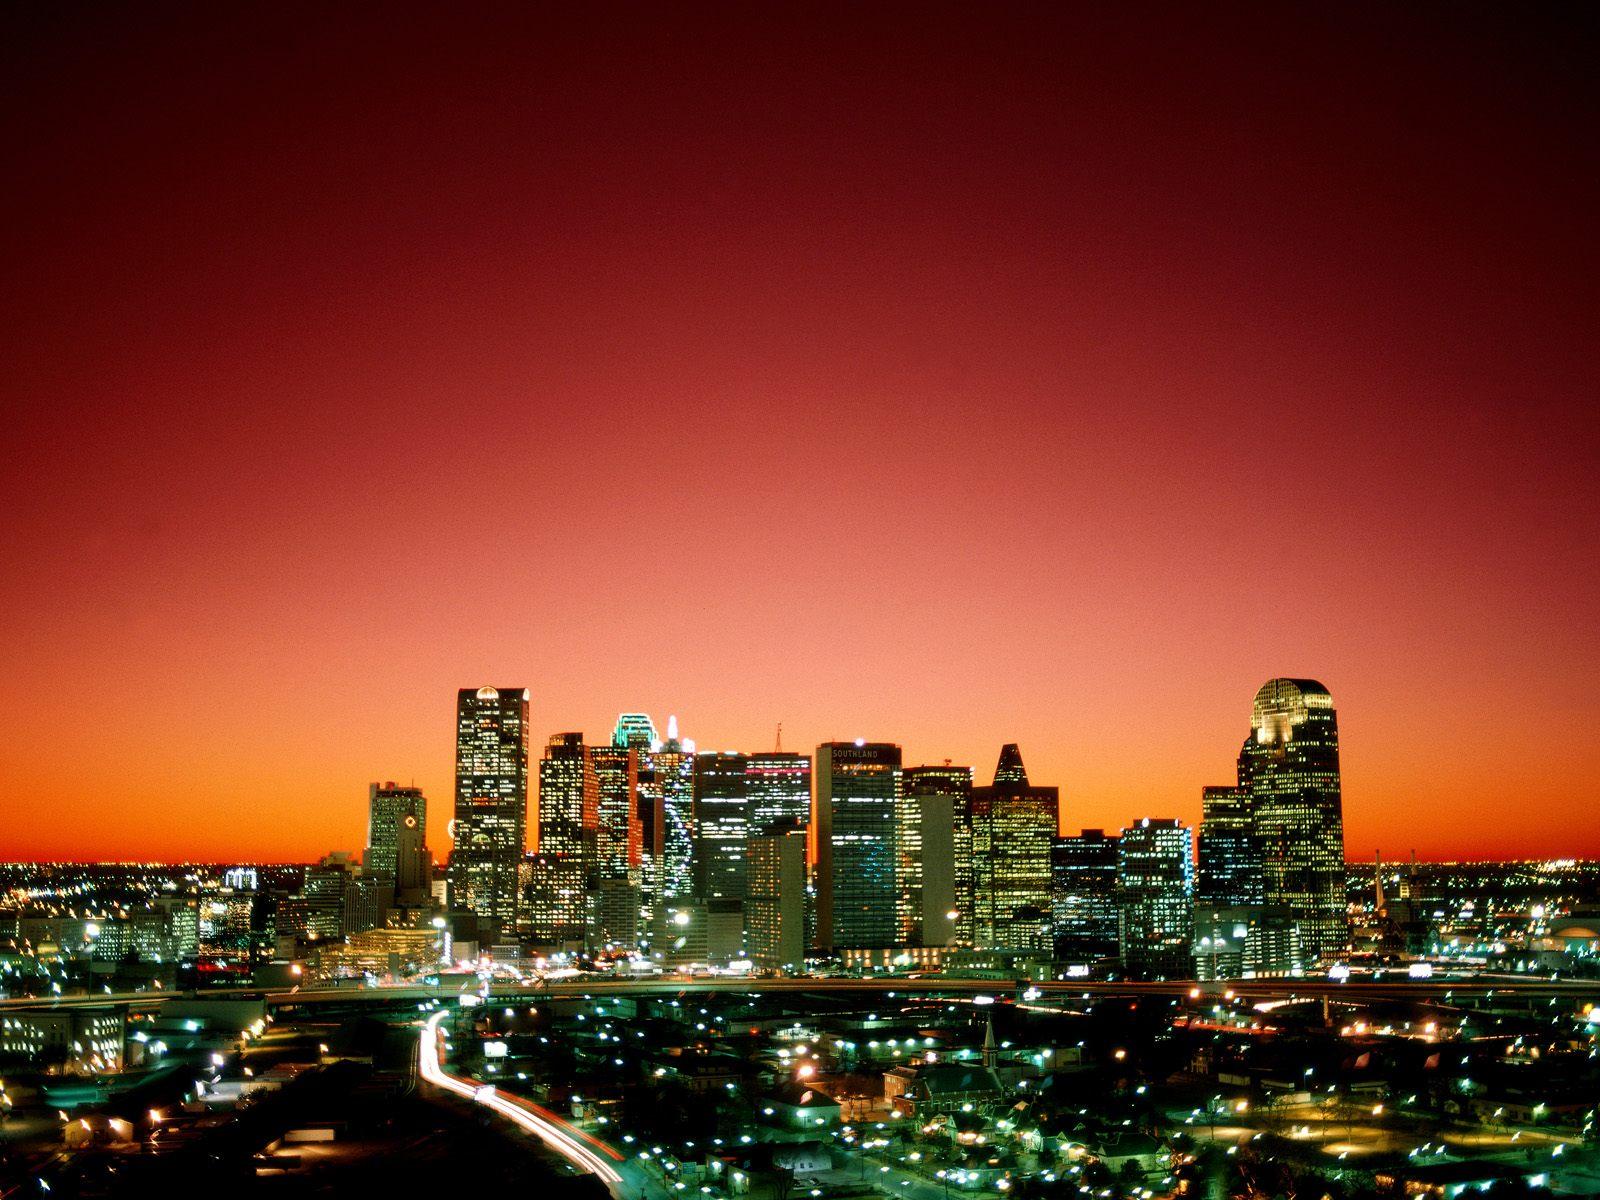 http://4.bp.blogspot.com/-n4gONIsEv6U/TVP0FwqnKFI/AAAAAAAAB5M/VqiO6-xkmbg/s1600/The+Big+D%252C+Dallas%252C+Texas.jpg